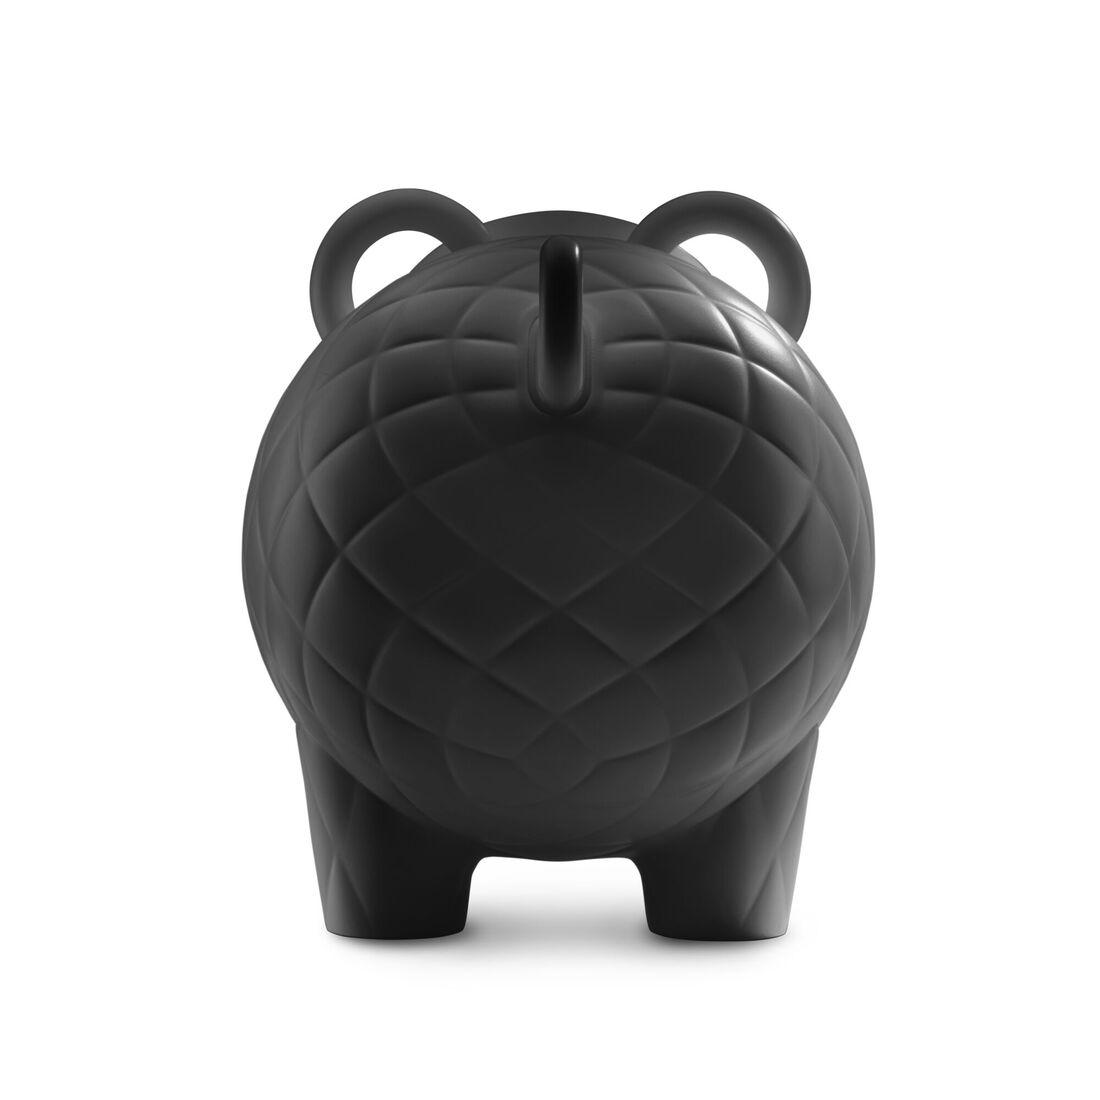 CYBEX Hausschwein - Black in Black large image number 4